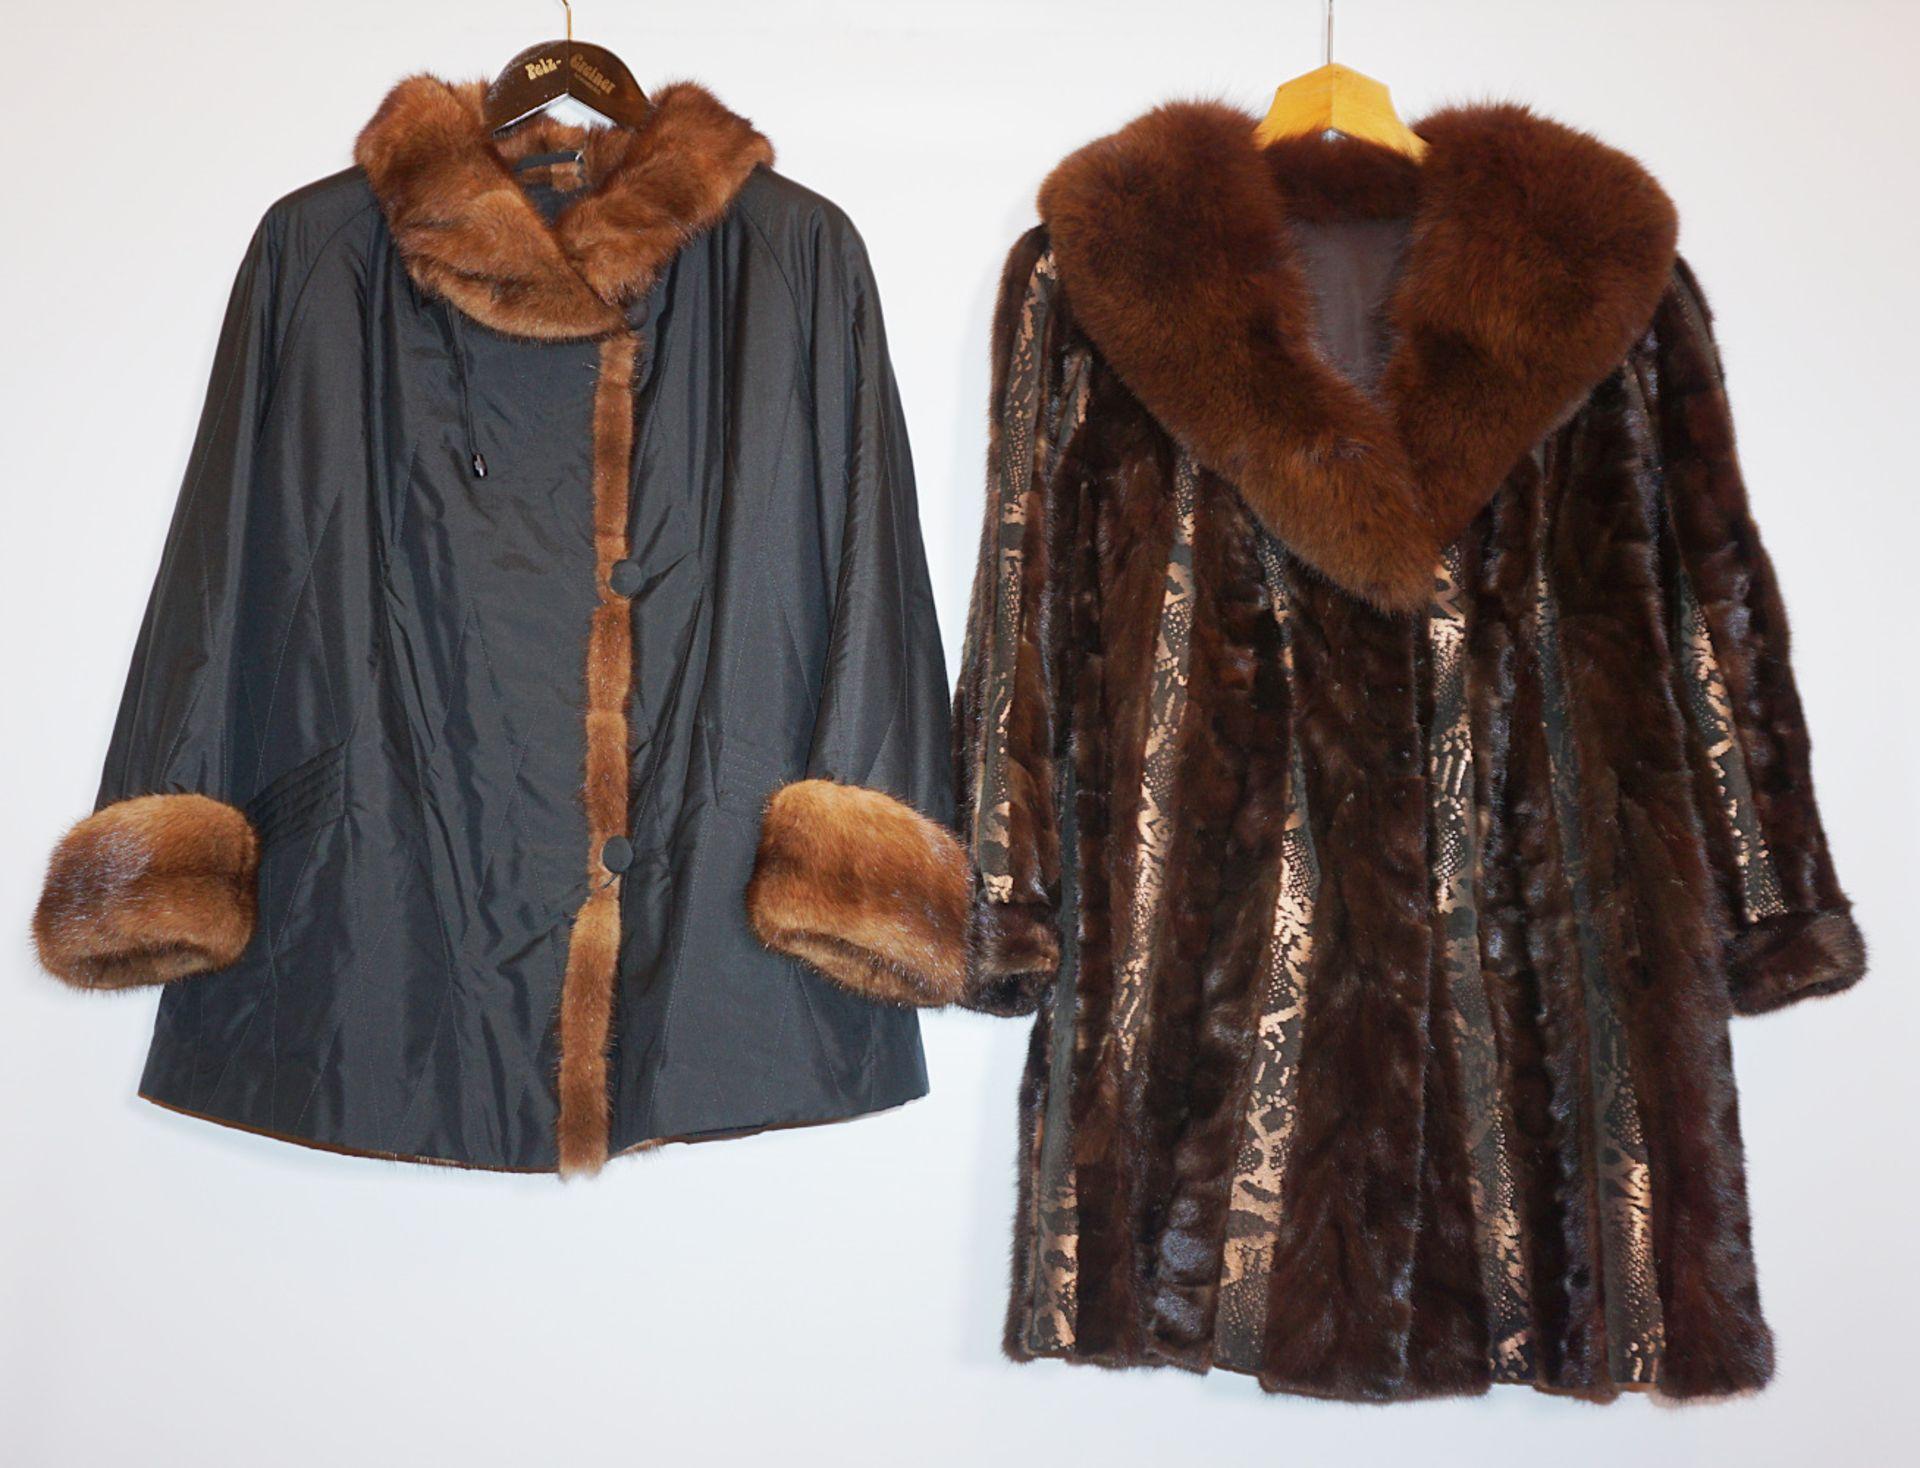 1 Jacke Textil m. Nerz RAAB & METZ sowie 1 Kurzmantel Nerz Mosaik/Leder Fuchskragen sowie Pelzzu